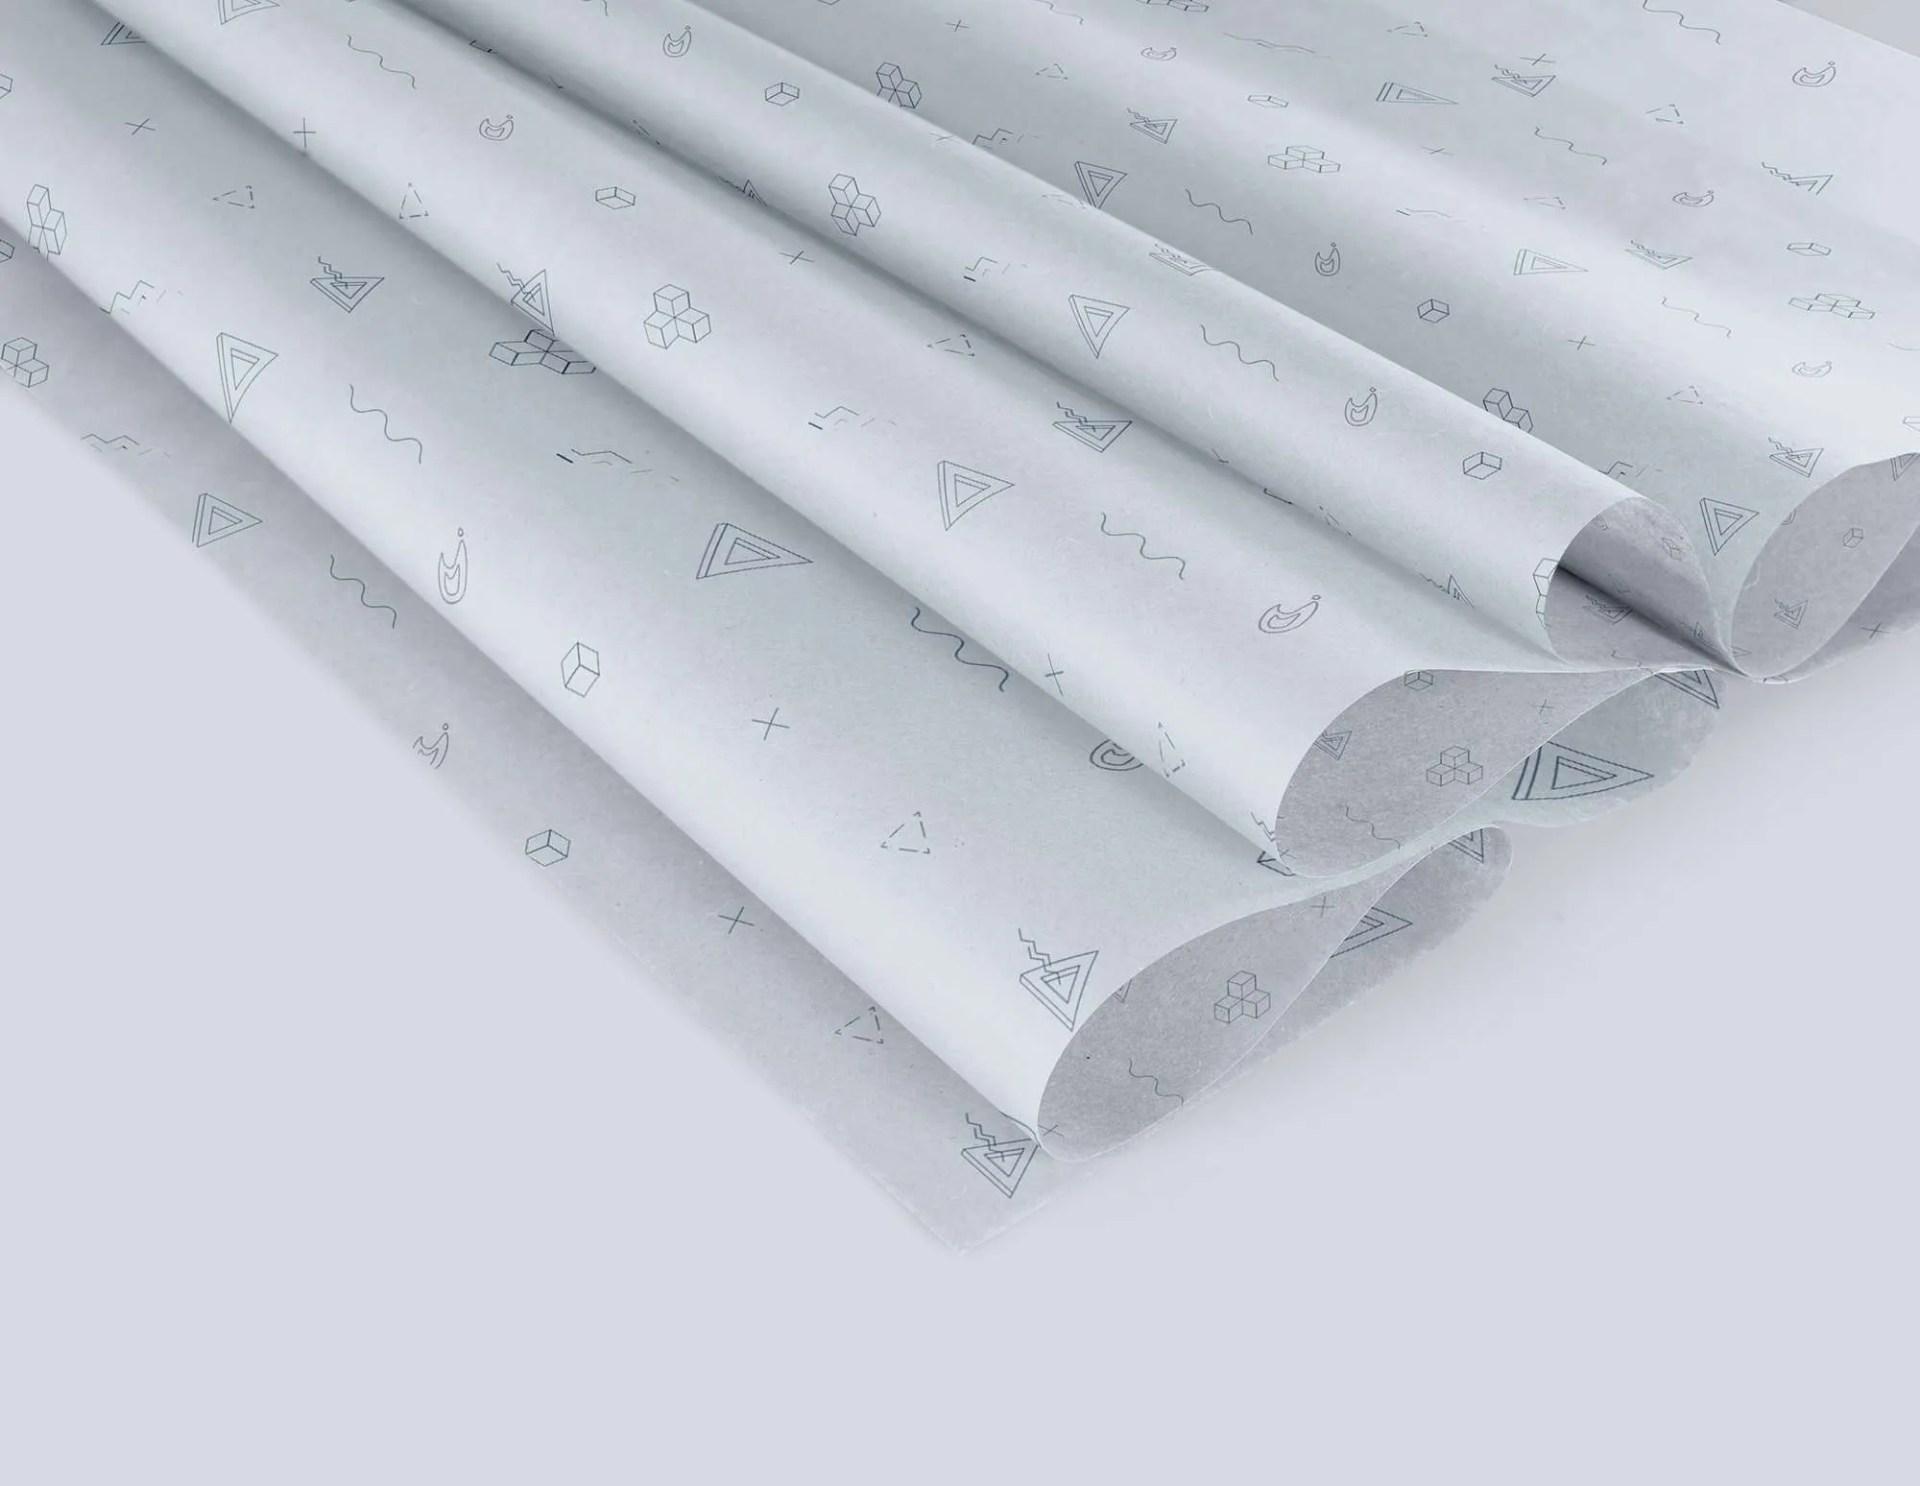 Nimble_Union_Tissue_Paper_1